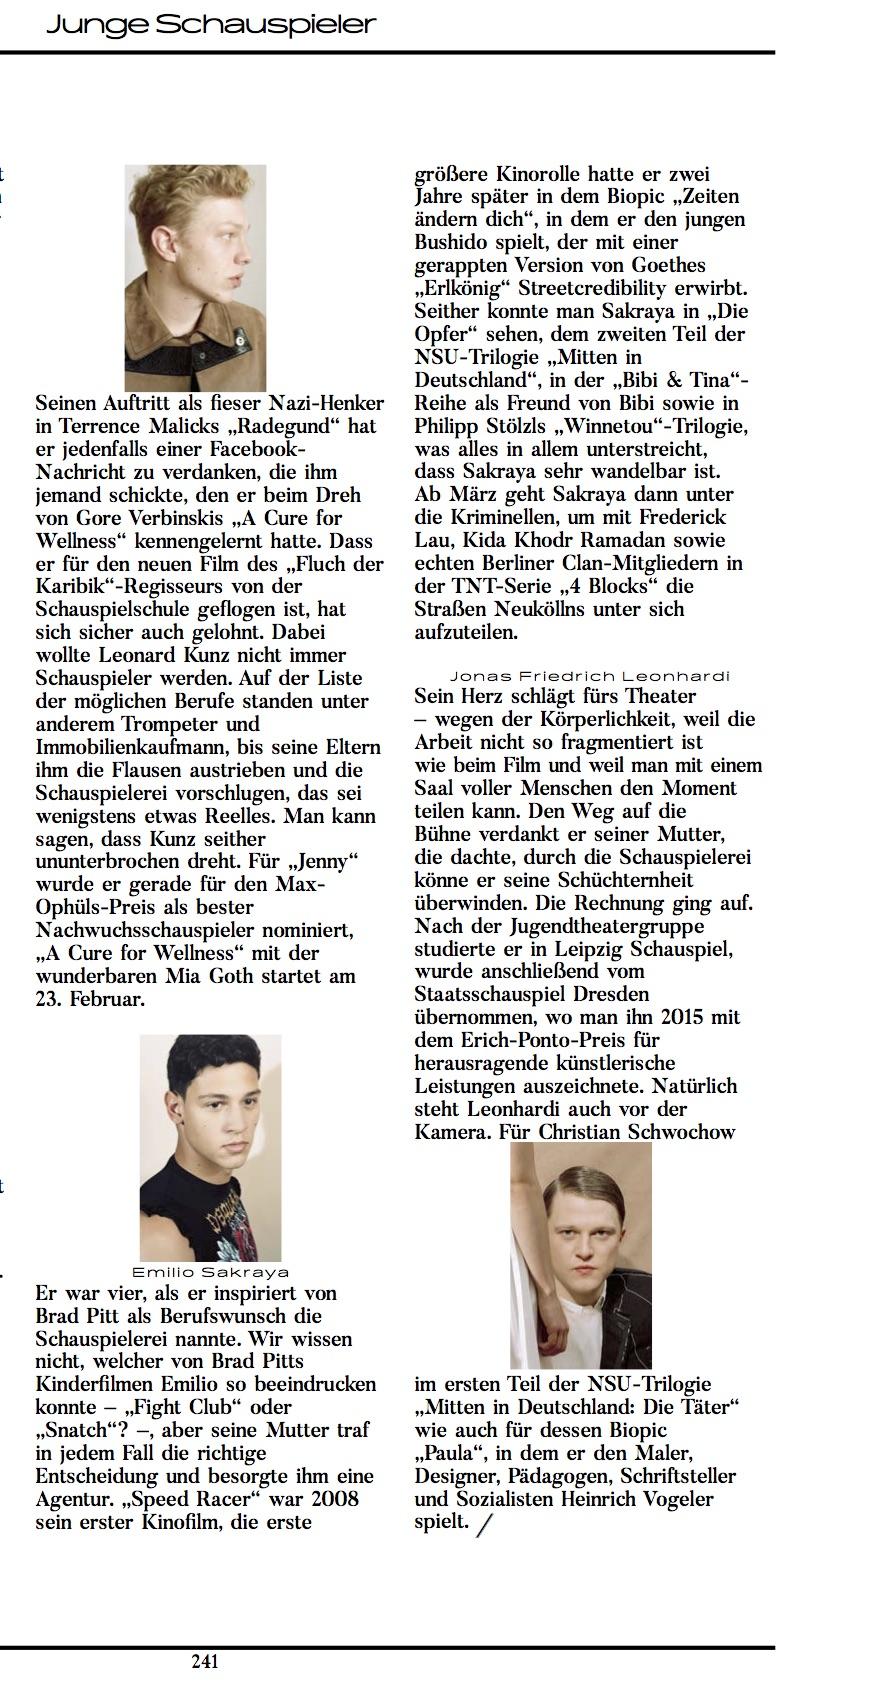 Emilio Sakraya @ Interview Magazin